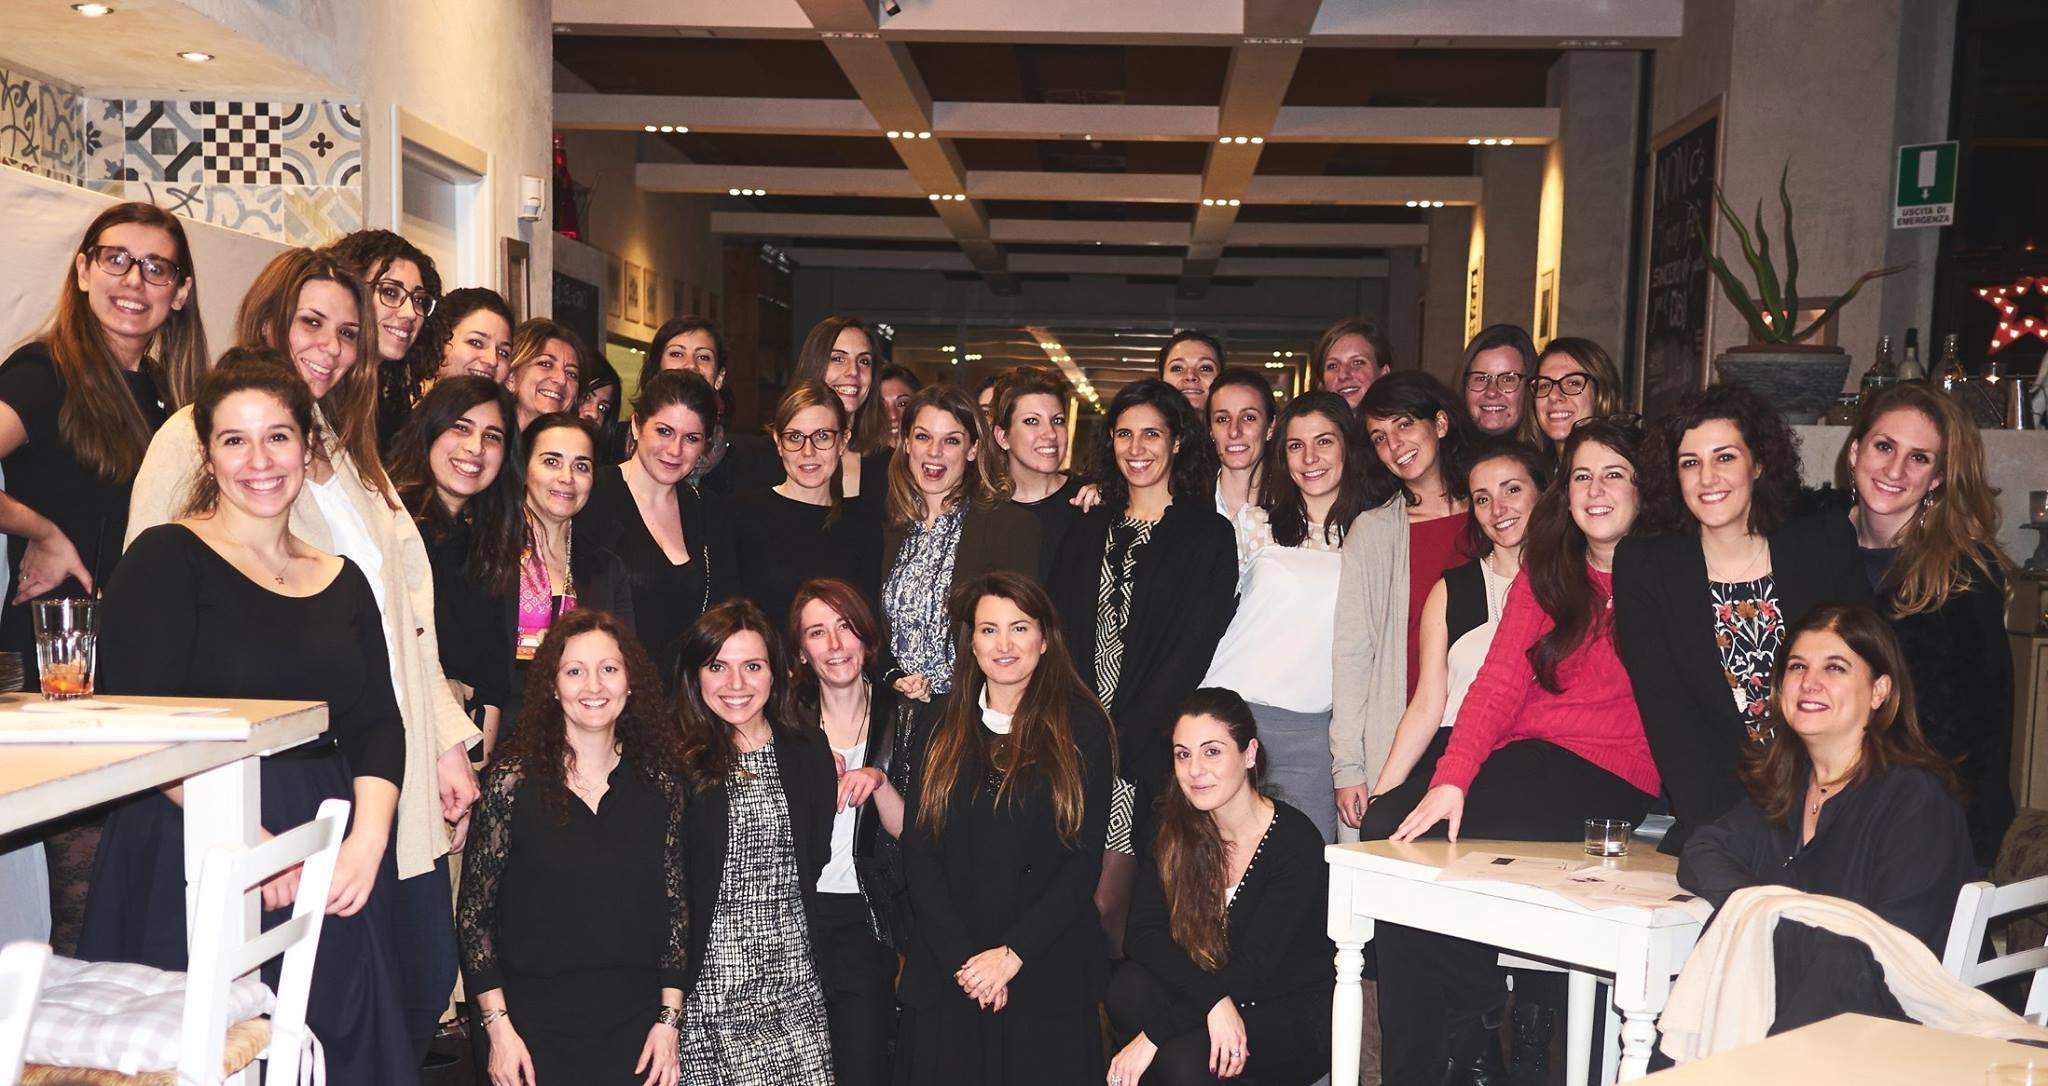 Programma di mentoring a Milano